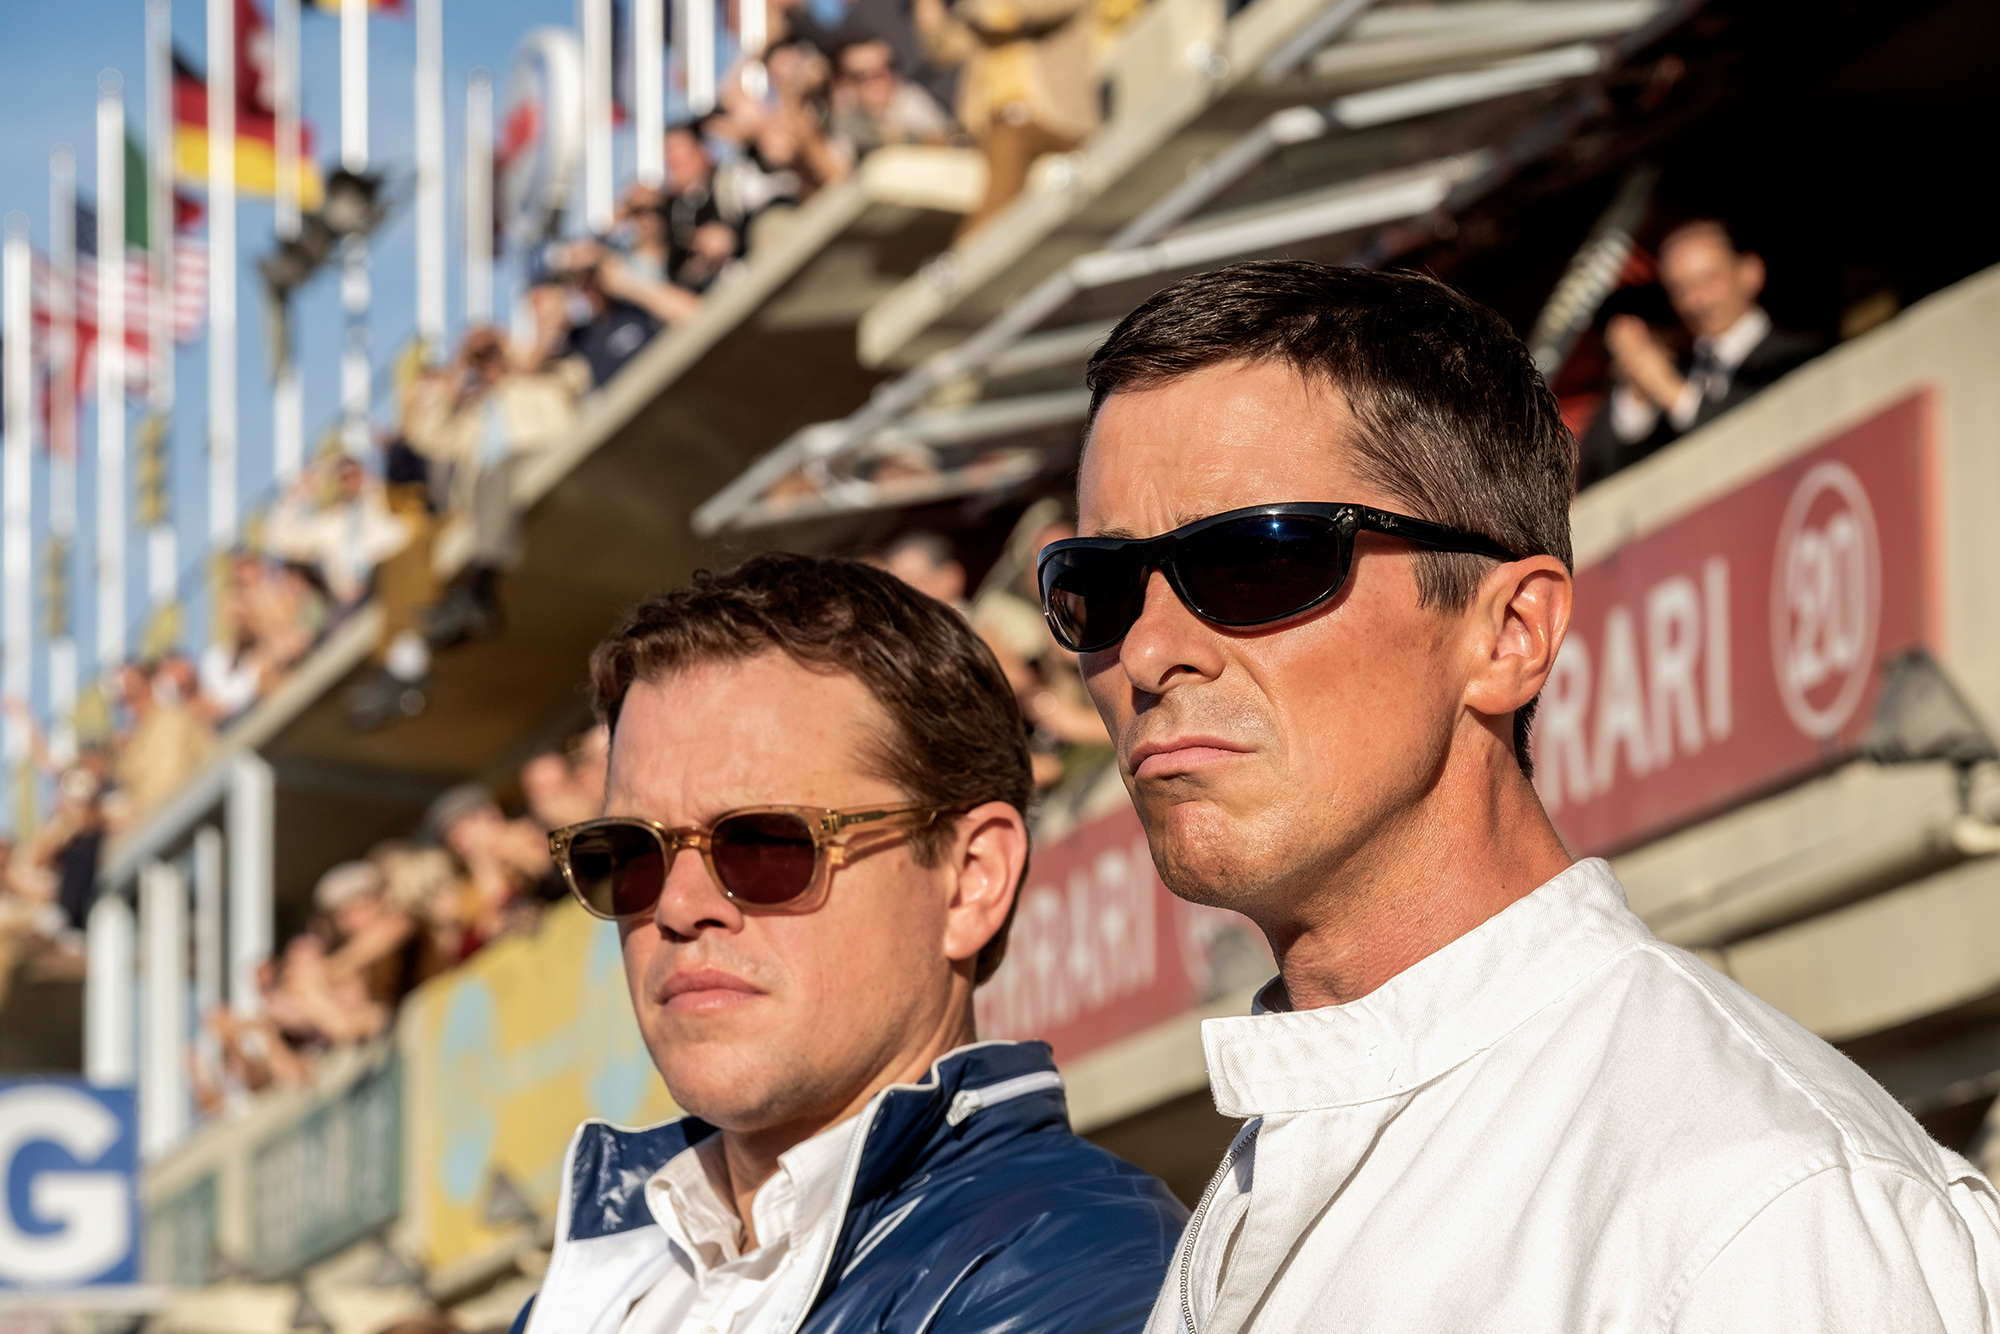 Ford vs Ferrari: why can't racing film directors get it right?